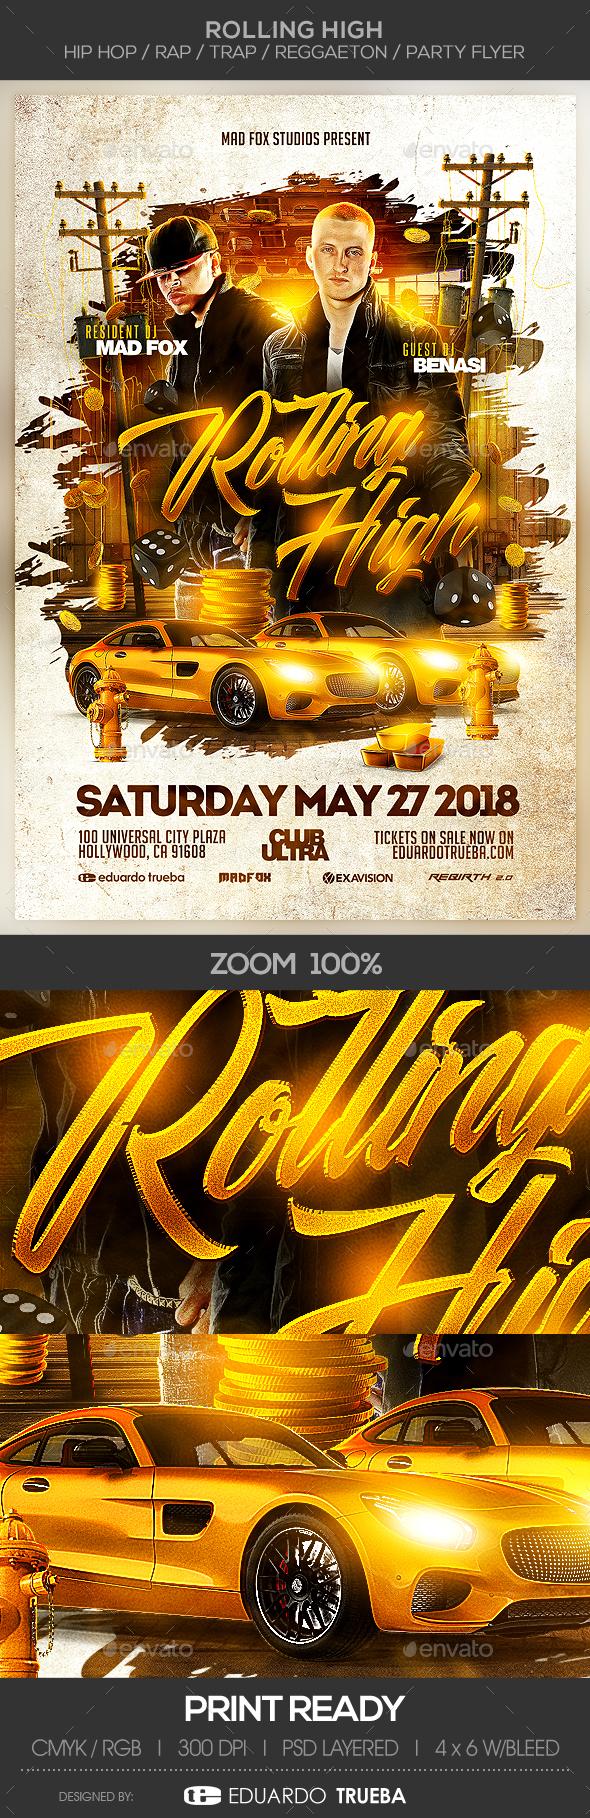 GraphicRiver Rolling High Hip Hop Rap Trap Reggaeton Party Flyer 20937018